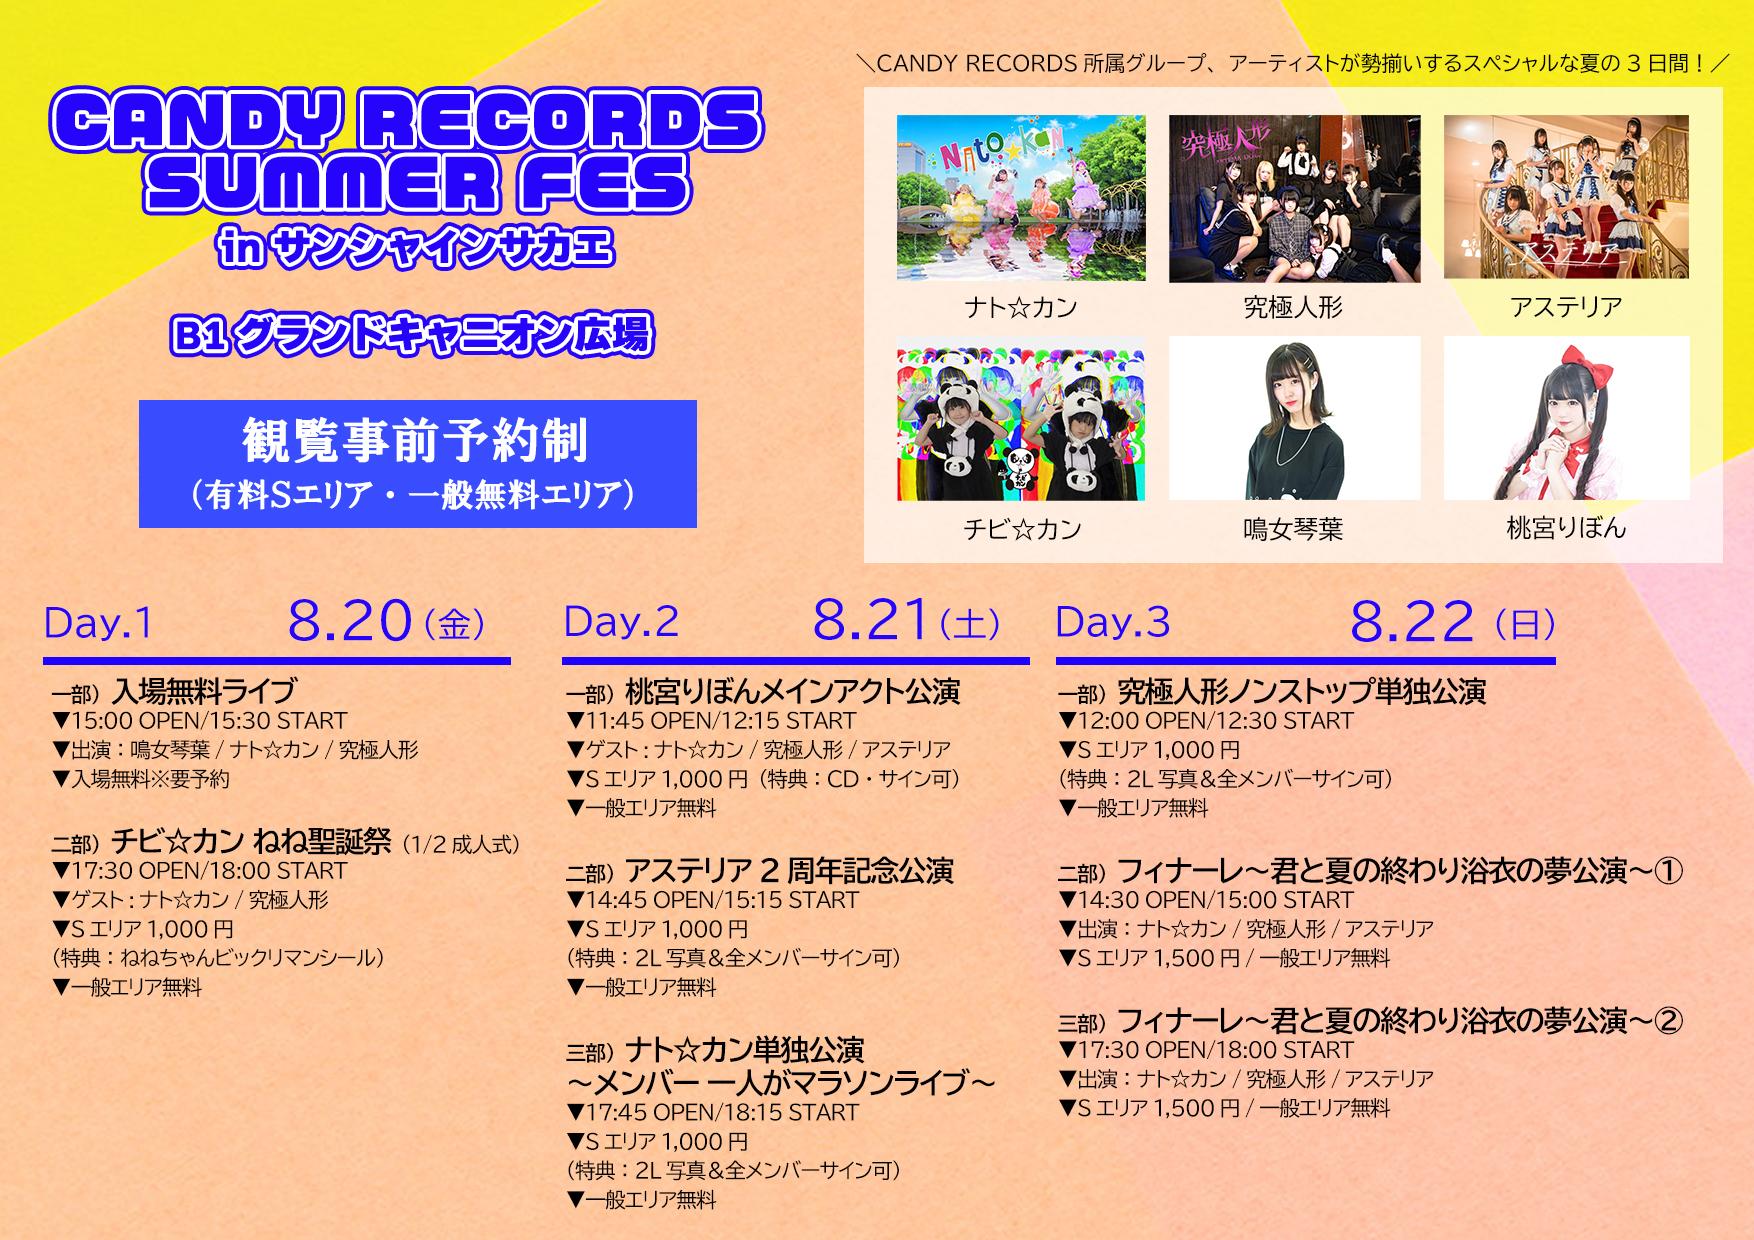 CANDY RECORDS SUMMER FES in サンシャインサカエ開催決定!